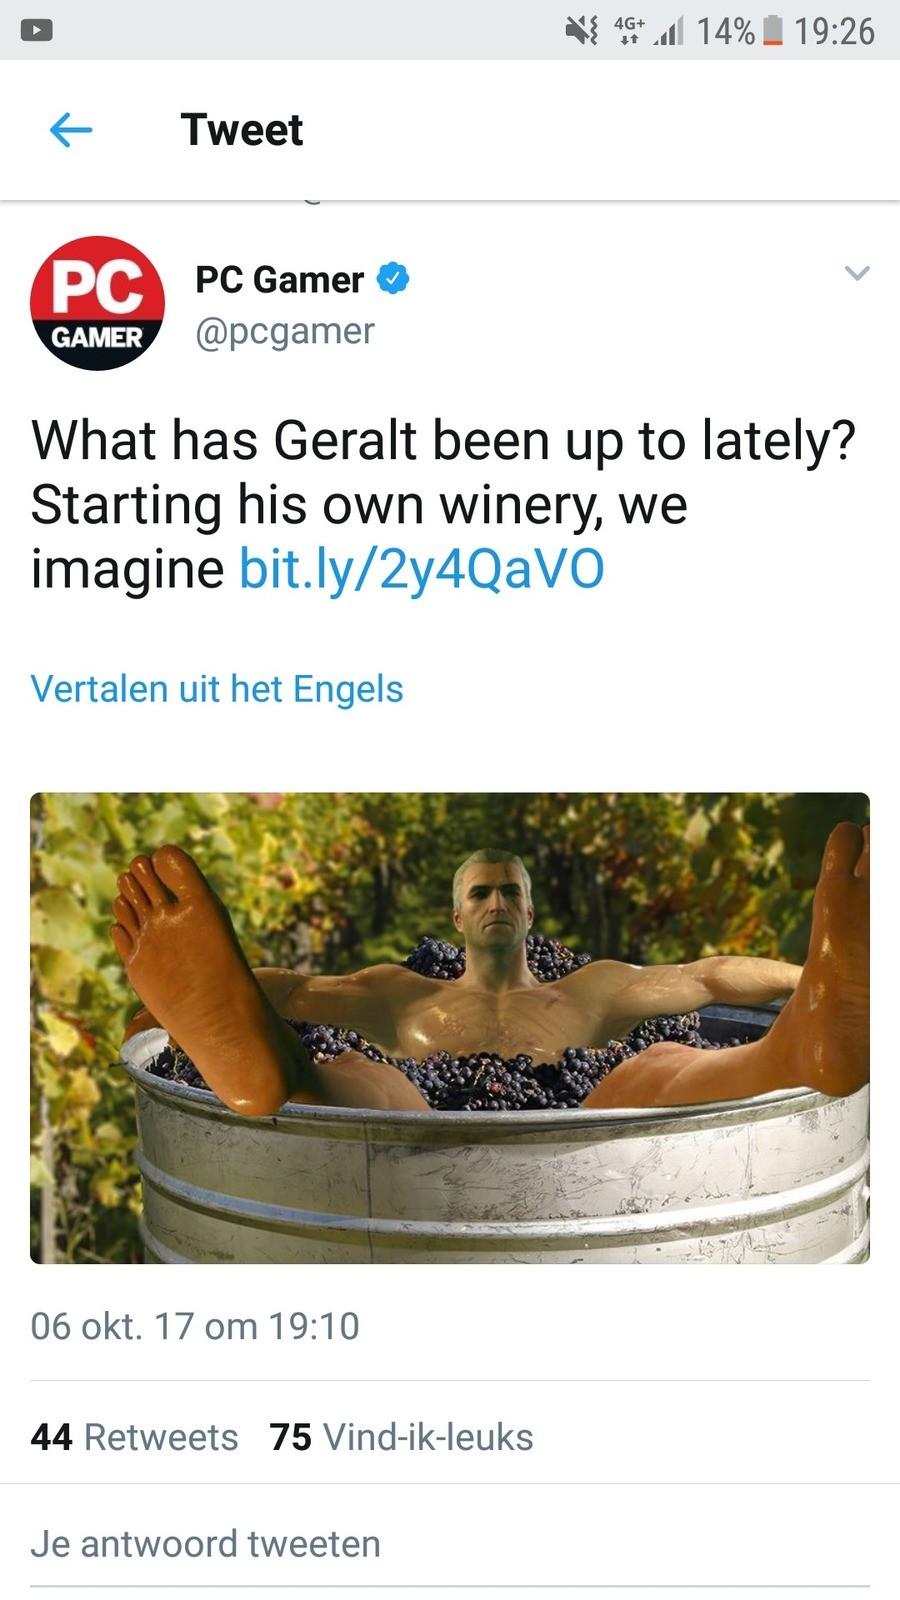 PC Gamer . . 6 Tweet IAI PC Garner to' pcgamer has Geralt been up to lately? Starting his winery, llbe Vertalen uit het Engels 06 on 17 om 19: 10 44 Retweets 75 PC Gamer 6 Tweet IAI Garner to' pcgamer has Geralt been up to lately? Starting his winery llbe Vertalen uit het Engels 06 on 17 om 19: 10 44 Retweets 75